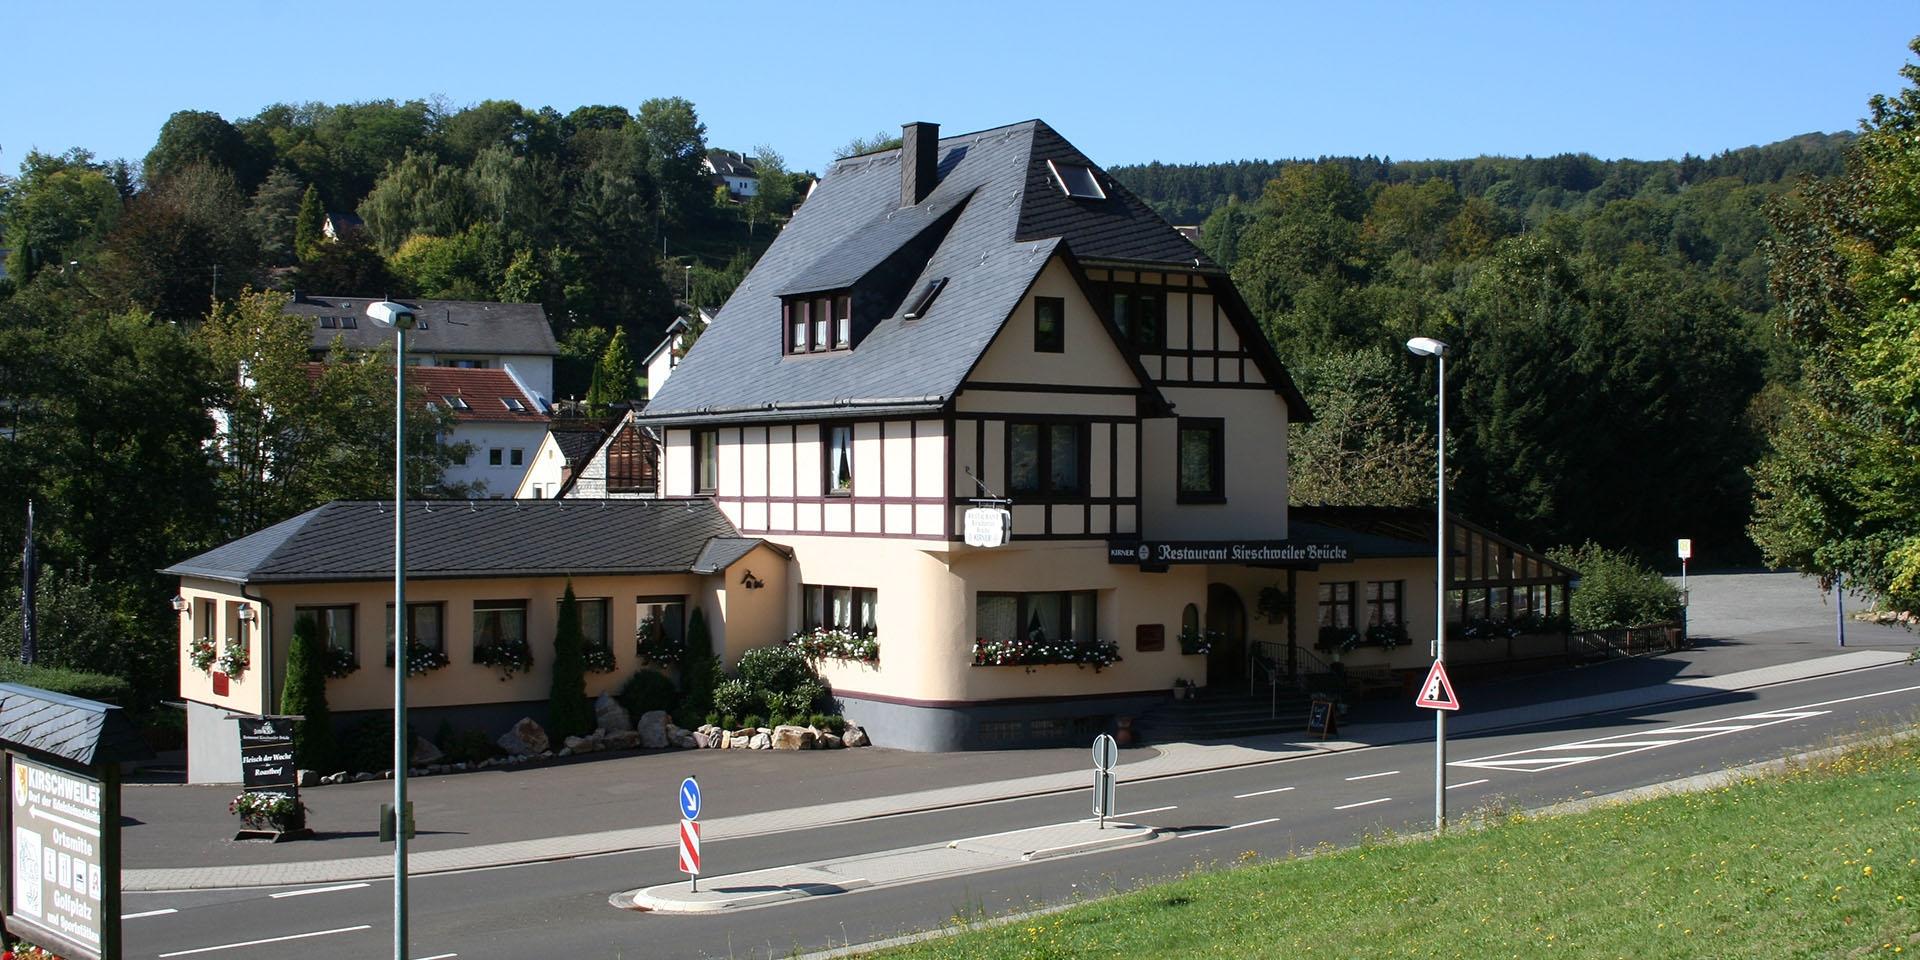 https://www.kirschweilerbruecke.de/files/images/slide4.jpg